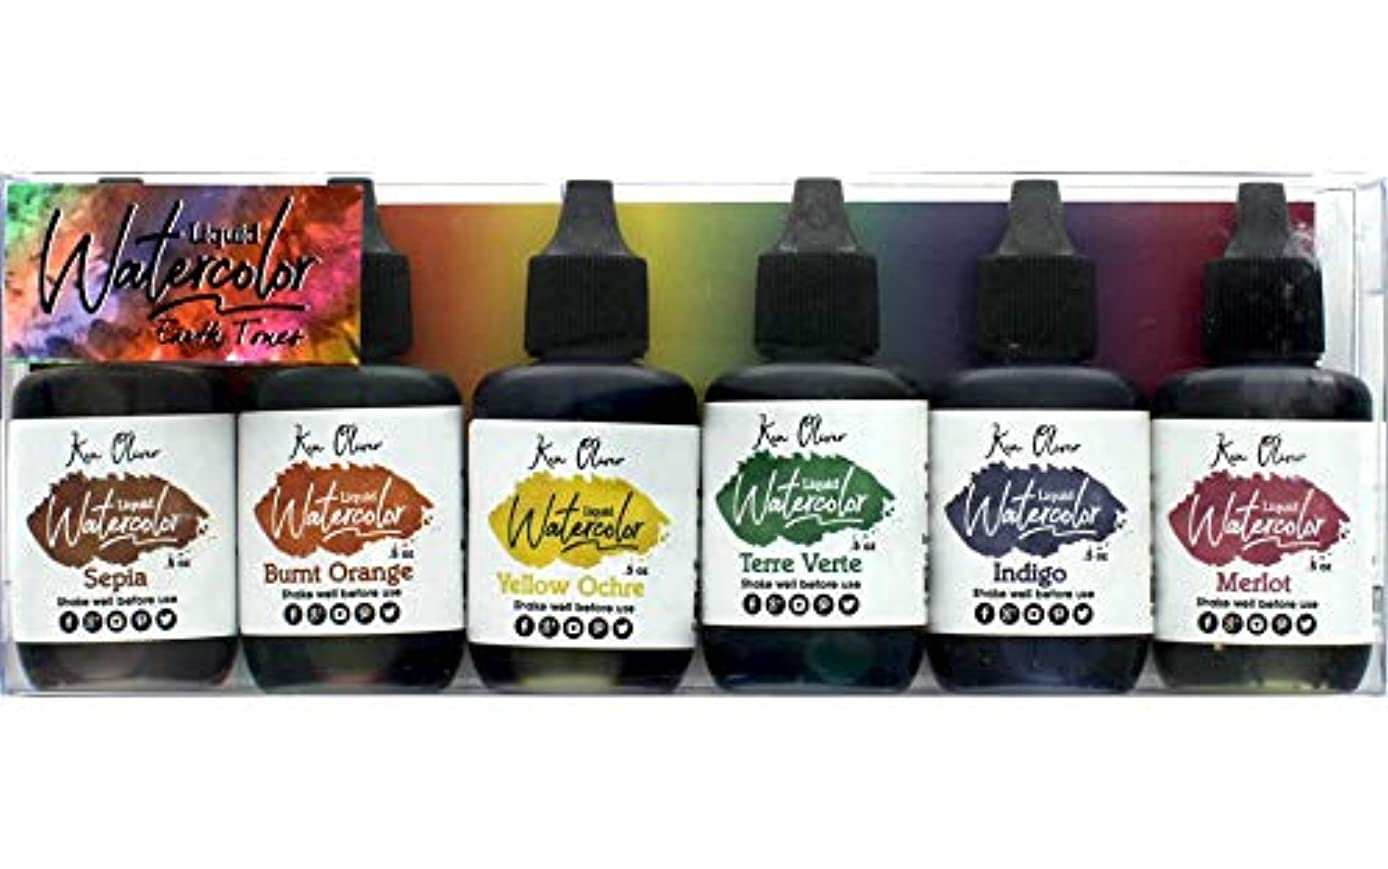 Contact USA KN08701 KO Liquid Watercolor Earth